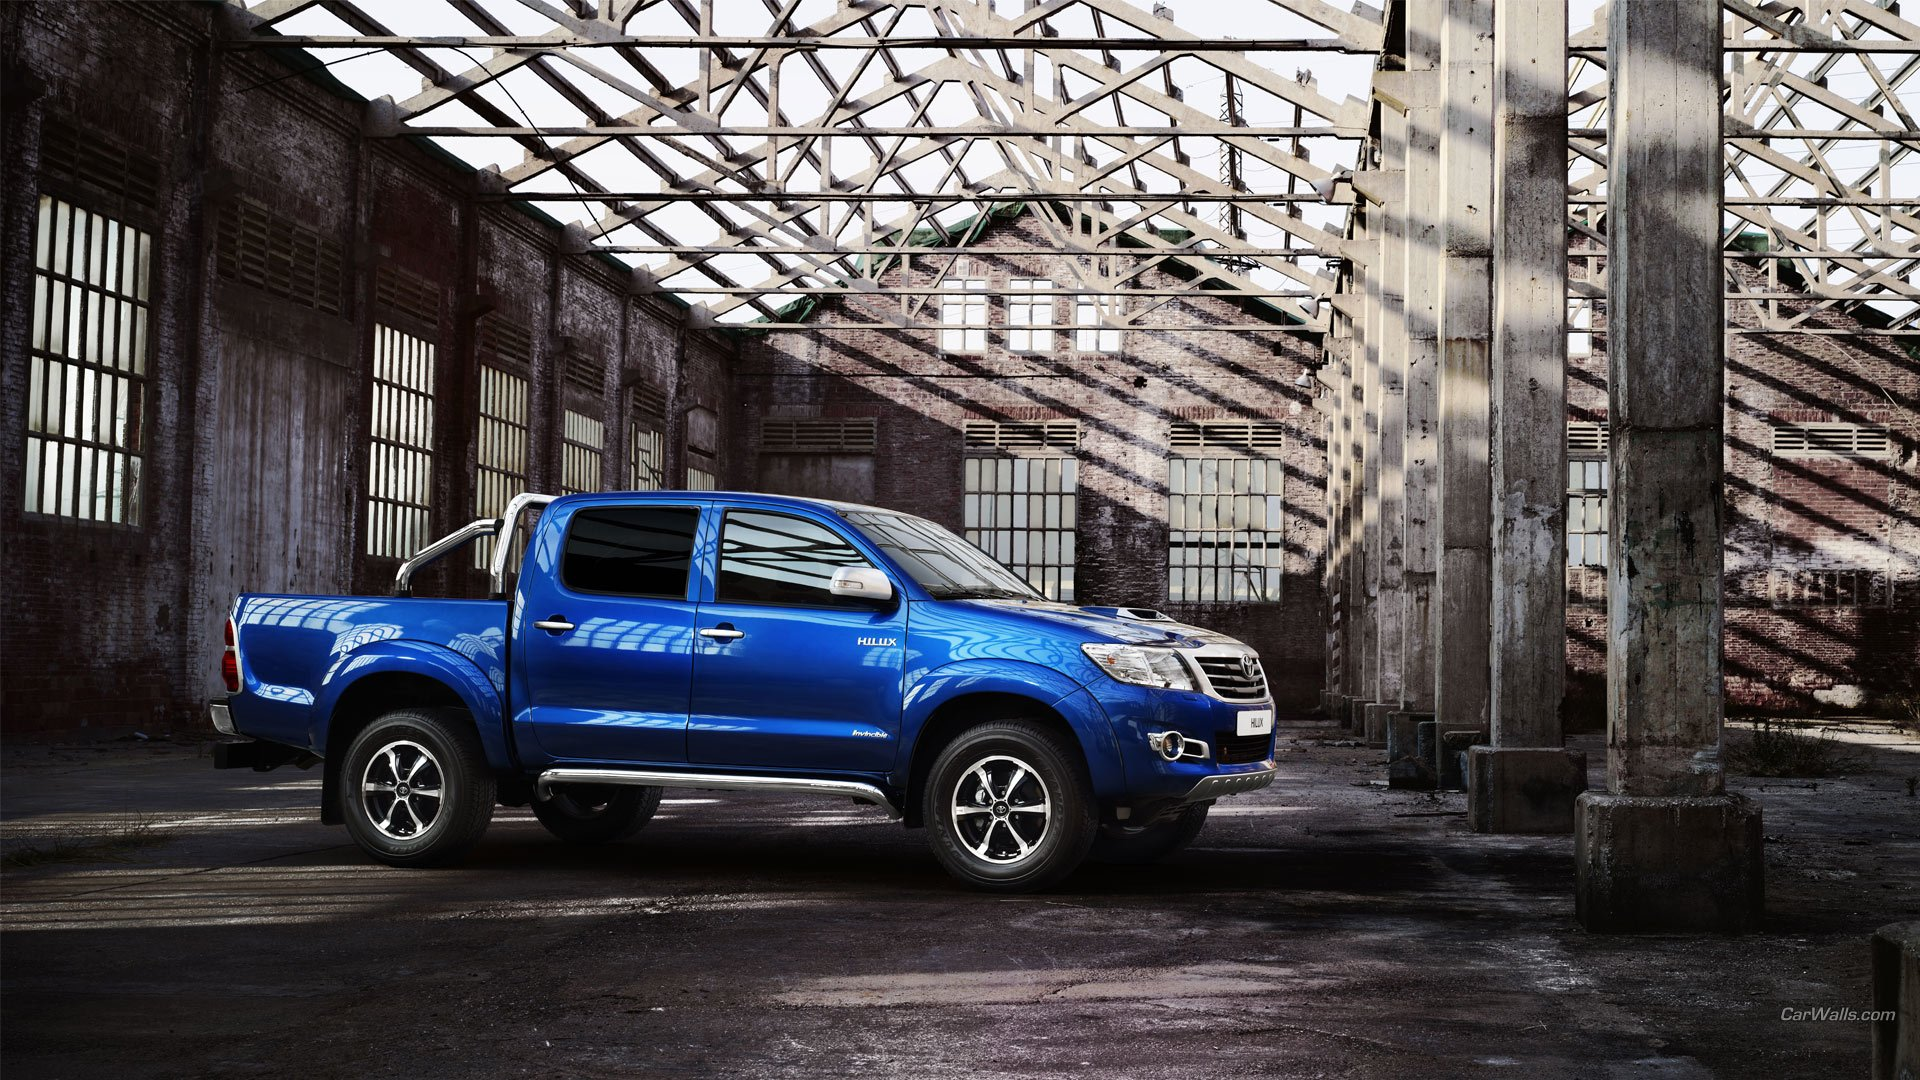 Toyota Hilux HD Wallpaper Background Image 1920x1080 ID 1920x1080